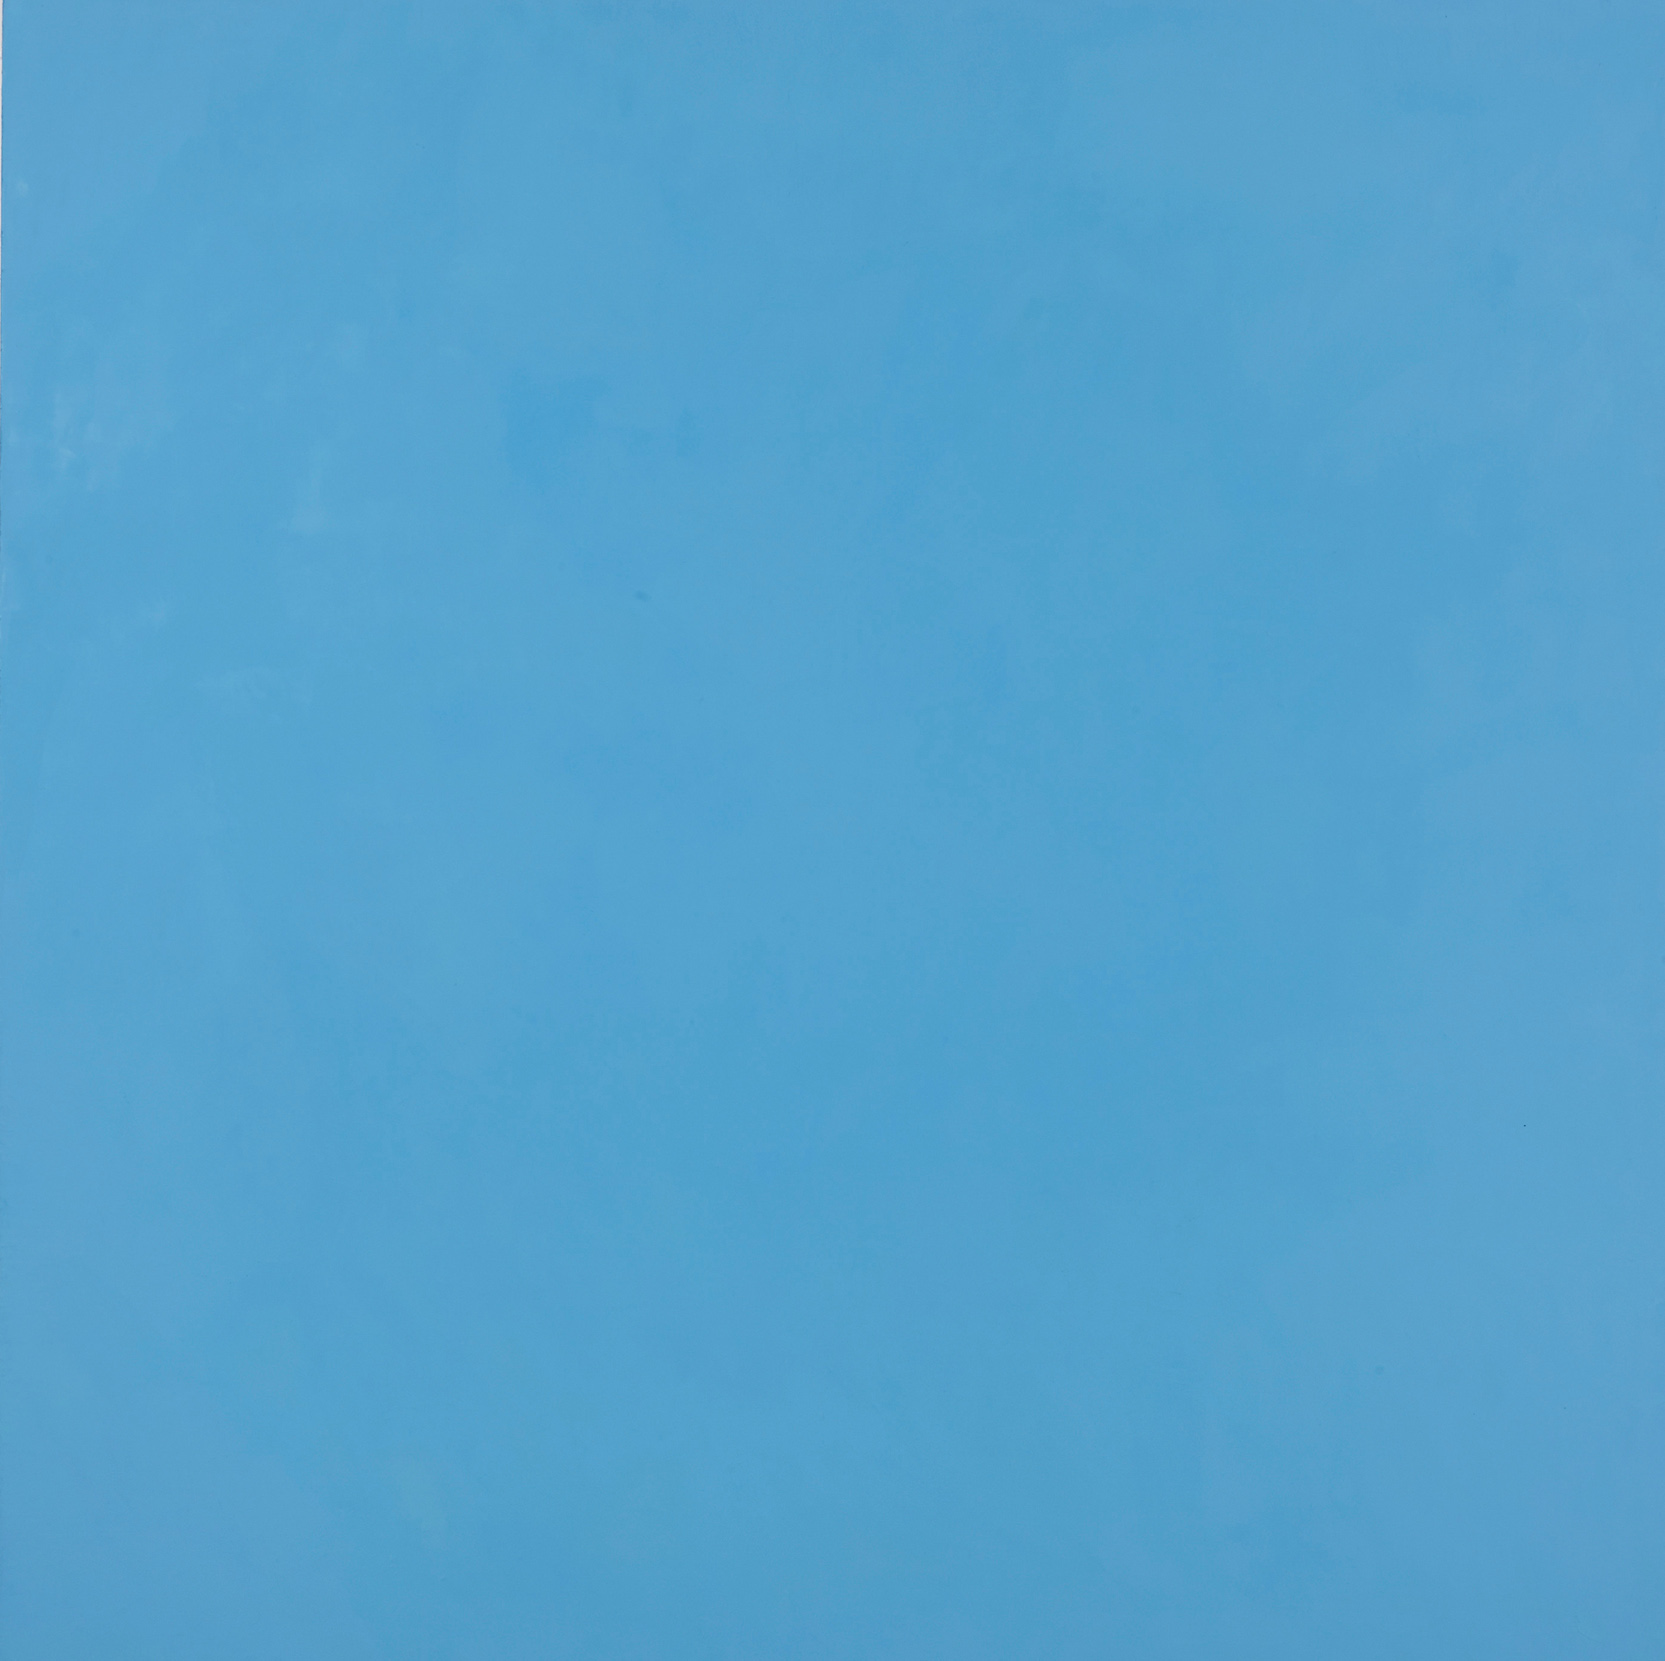 DAVID SERISIER   Gallium Sky Painting - Light Blue , 2014  oil and wax on linen  198 x 198 cm